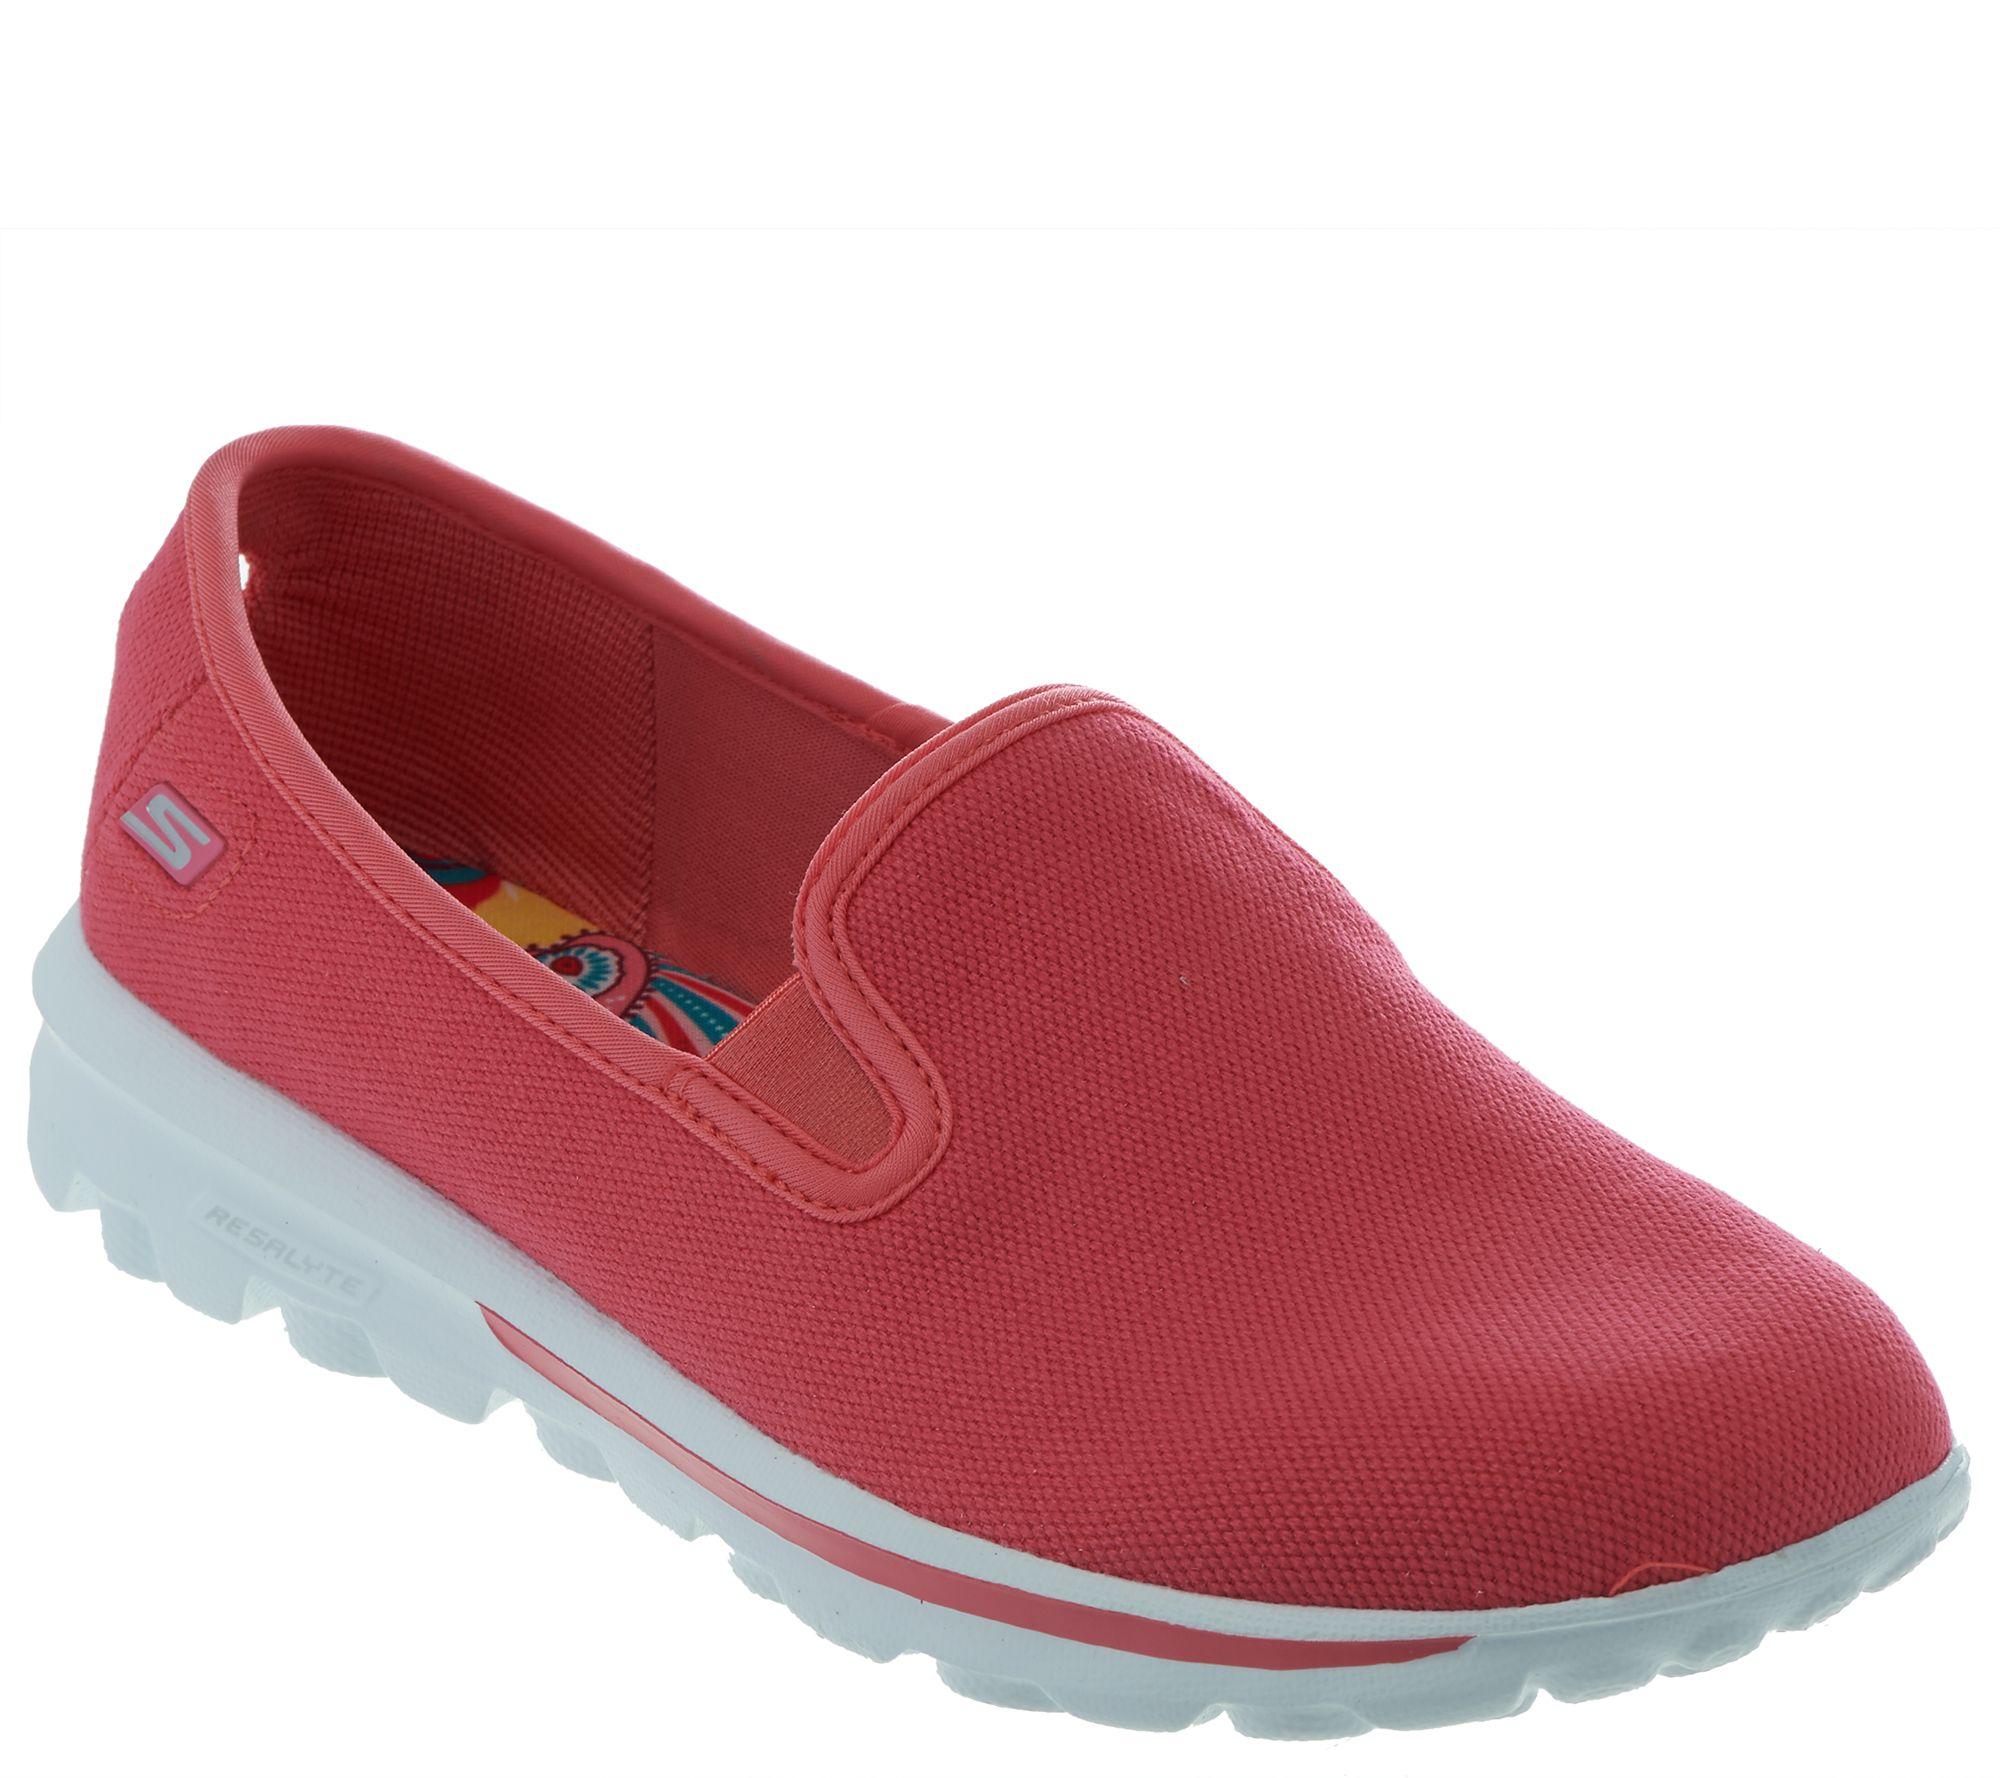 Skechers GOwalk Canvas Slip-on Sneakers